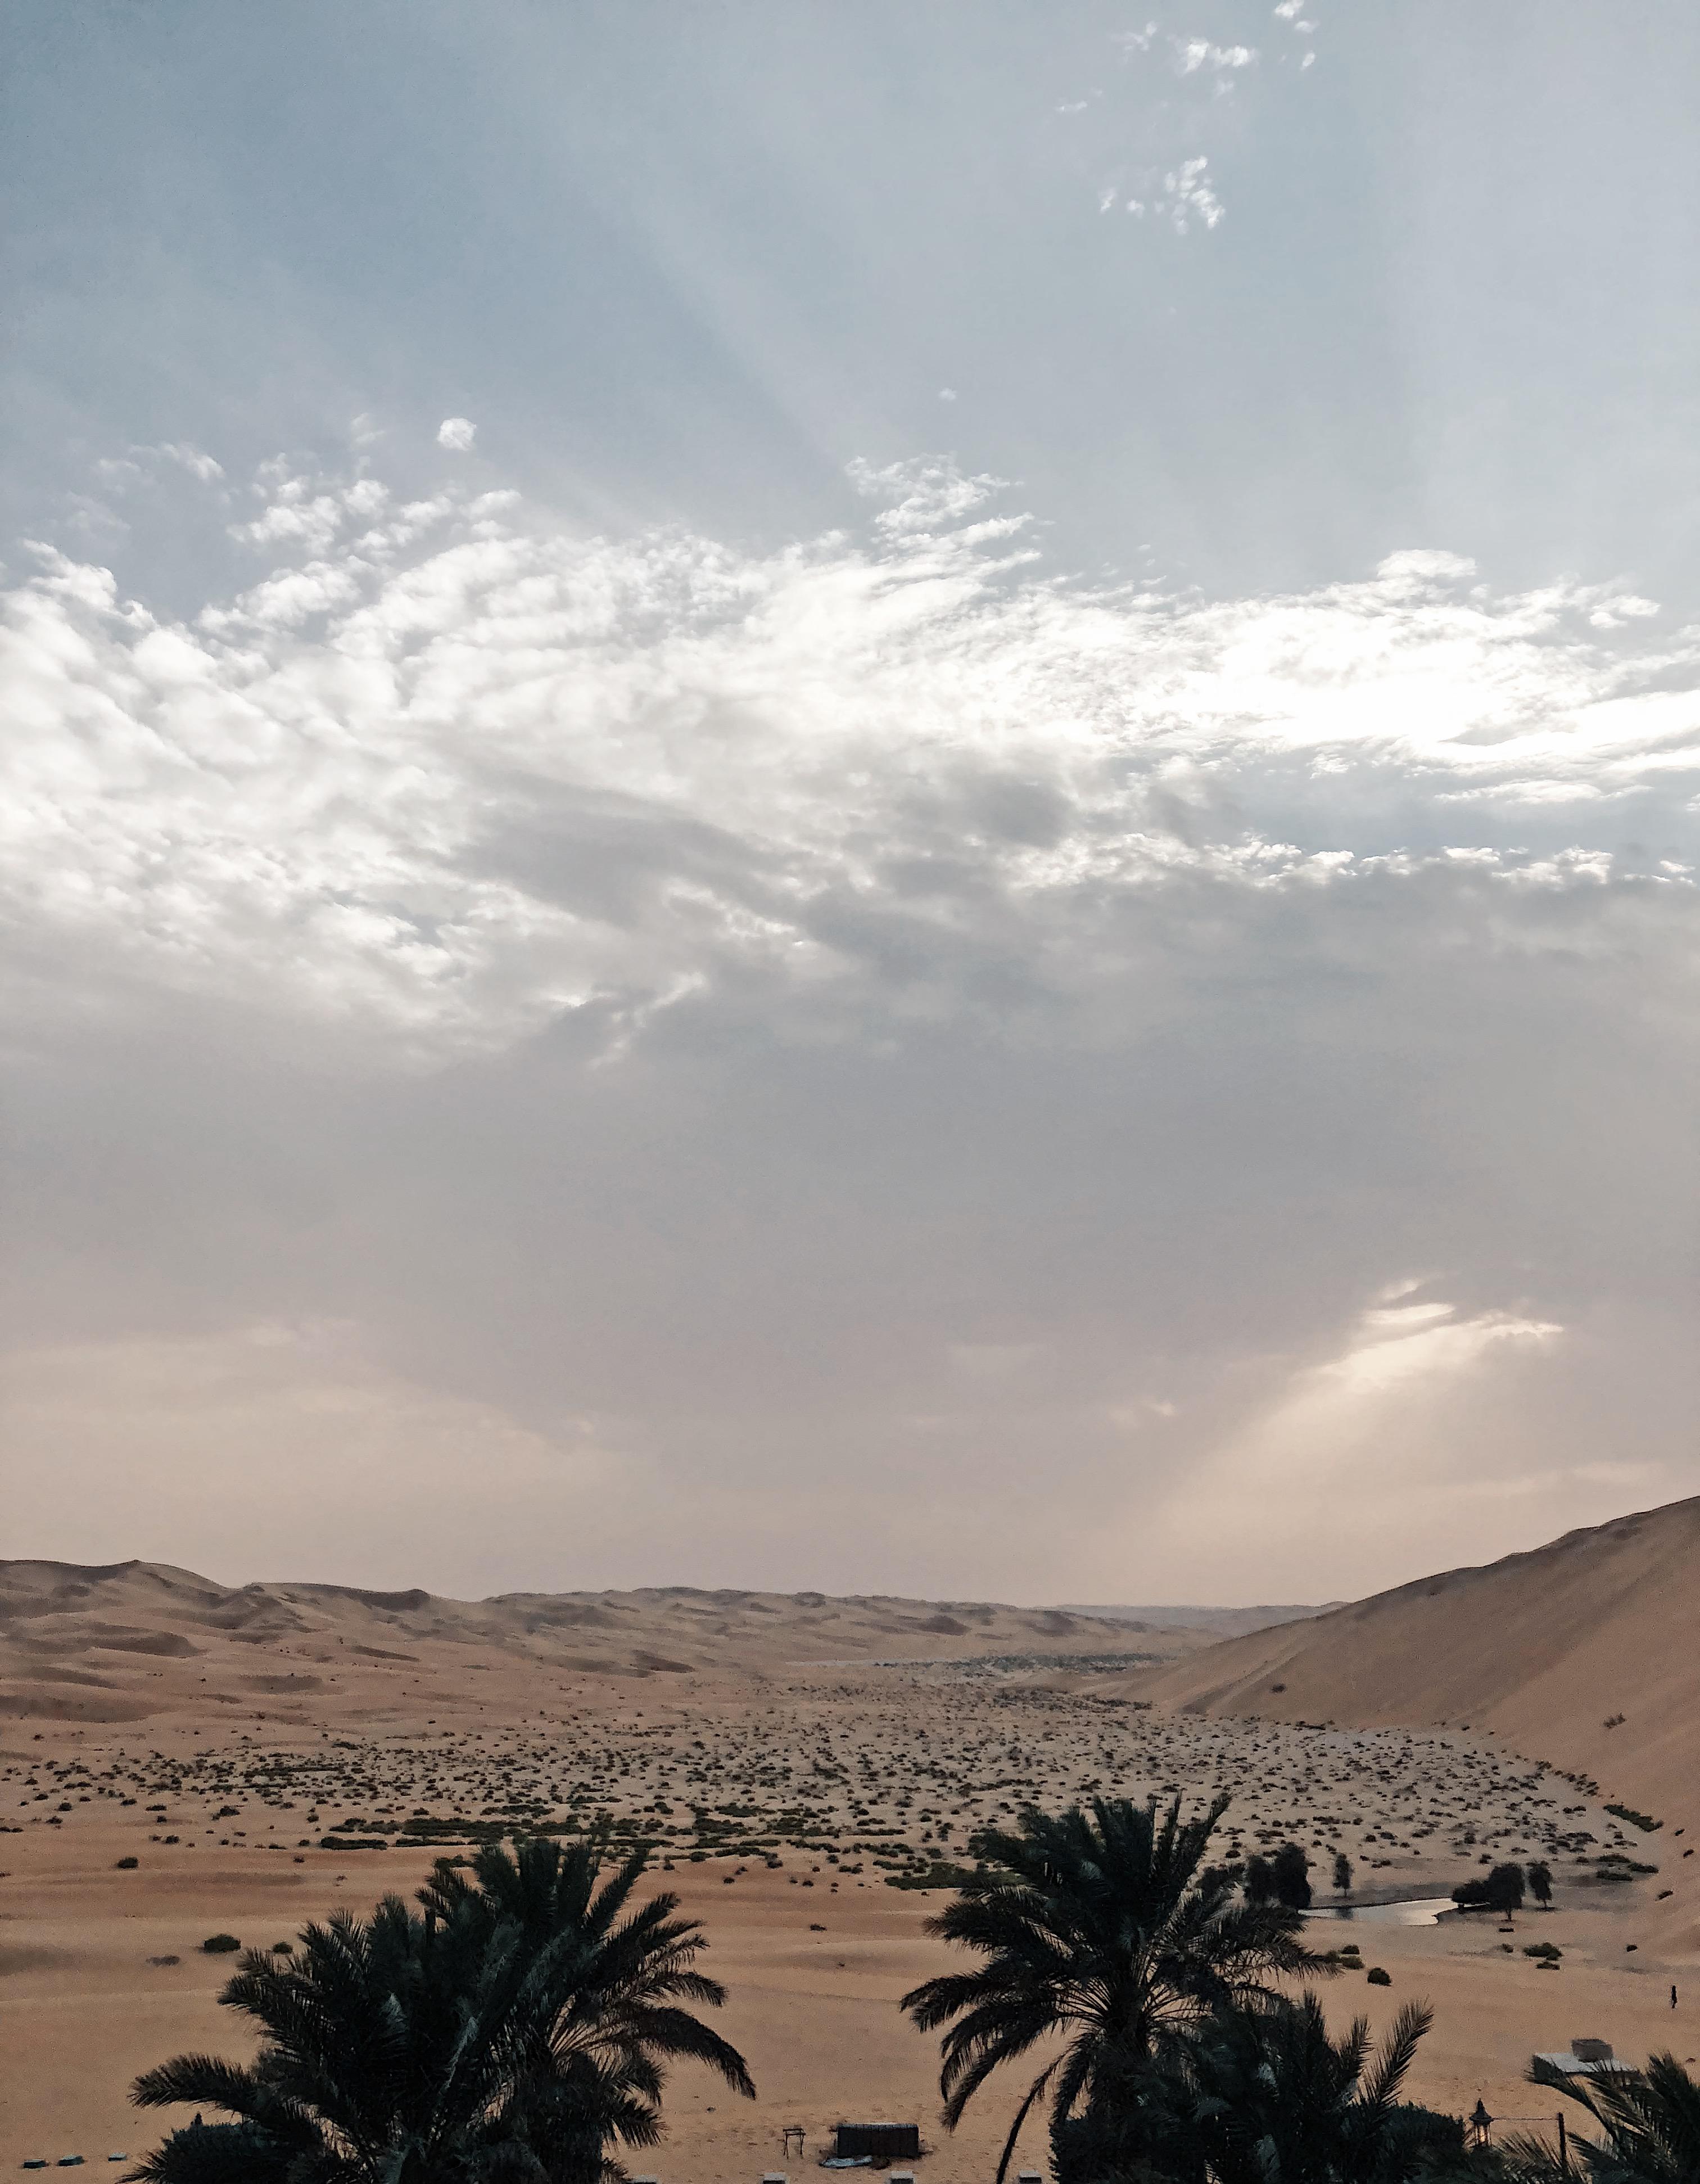 blog mode dorisknowsfashion voyage abu dhabi desert